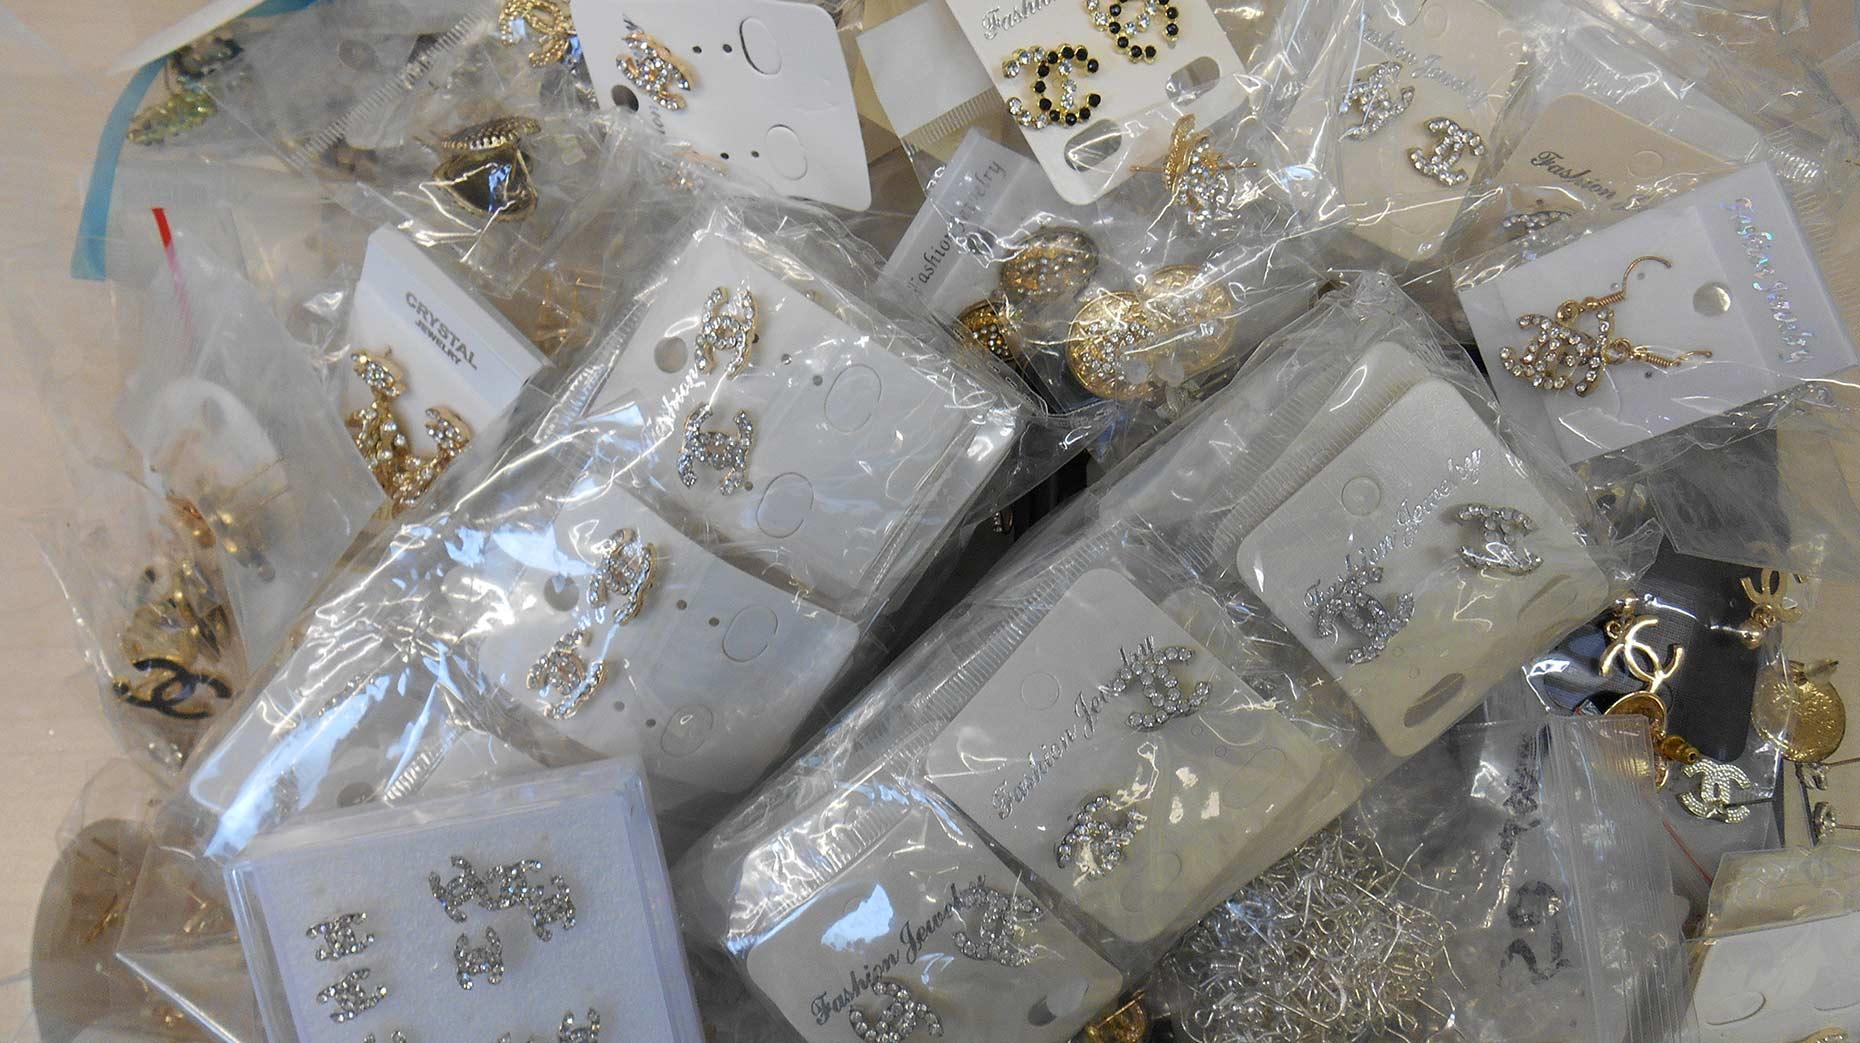 Counterfeit-Jewellery